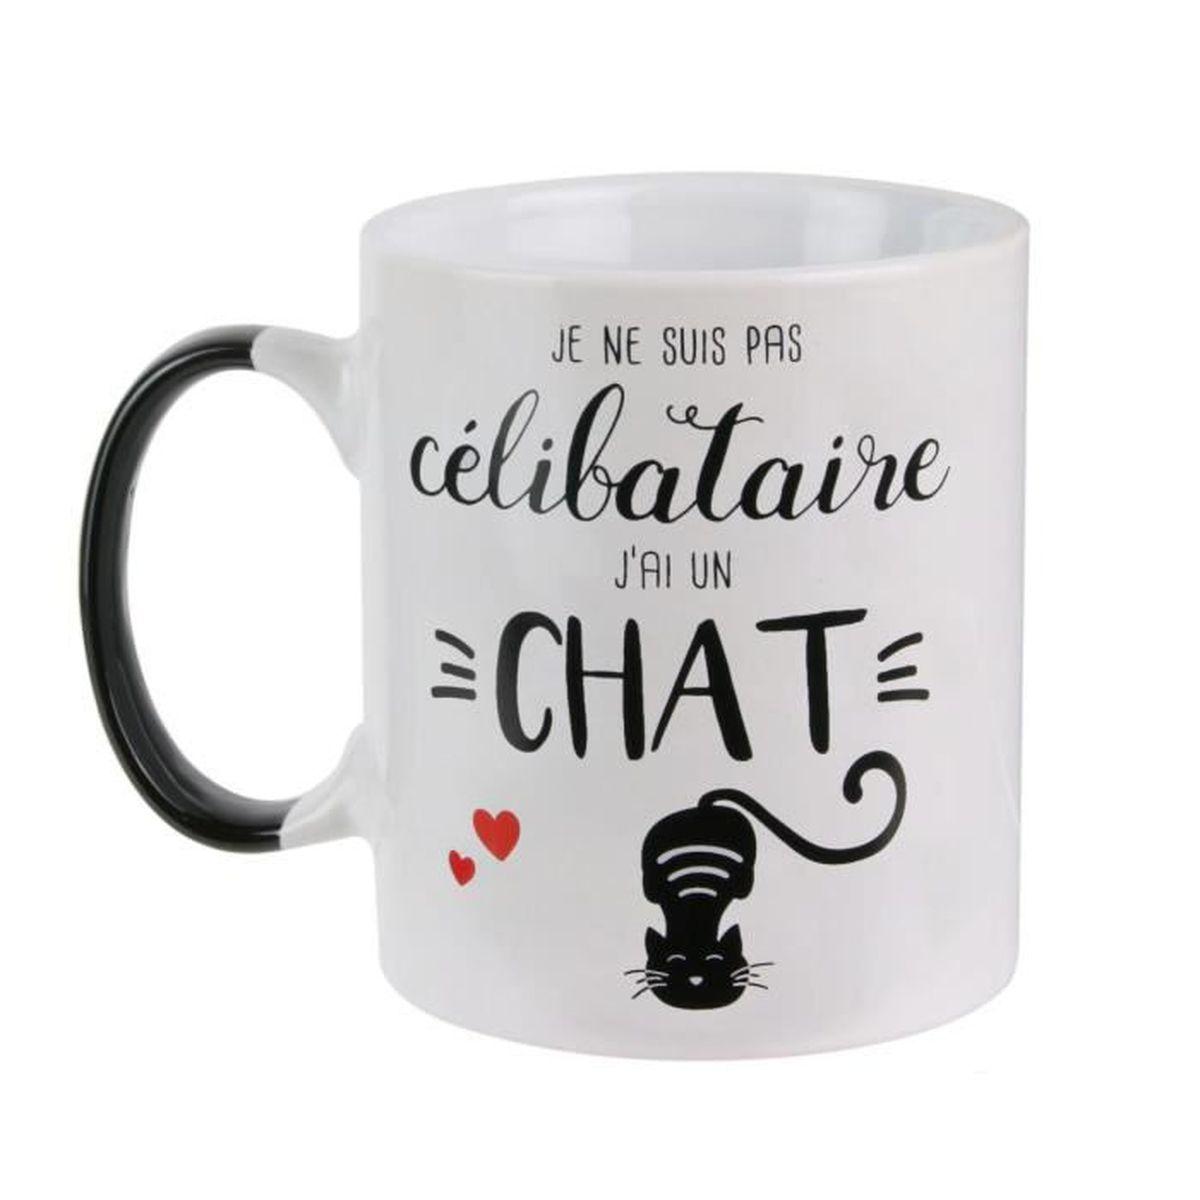 chate celibataire)